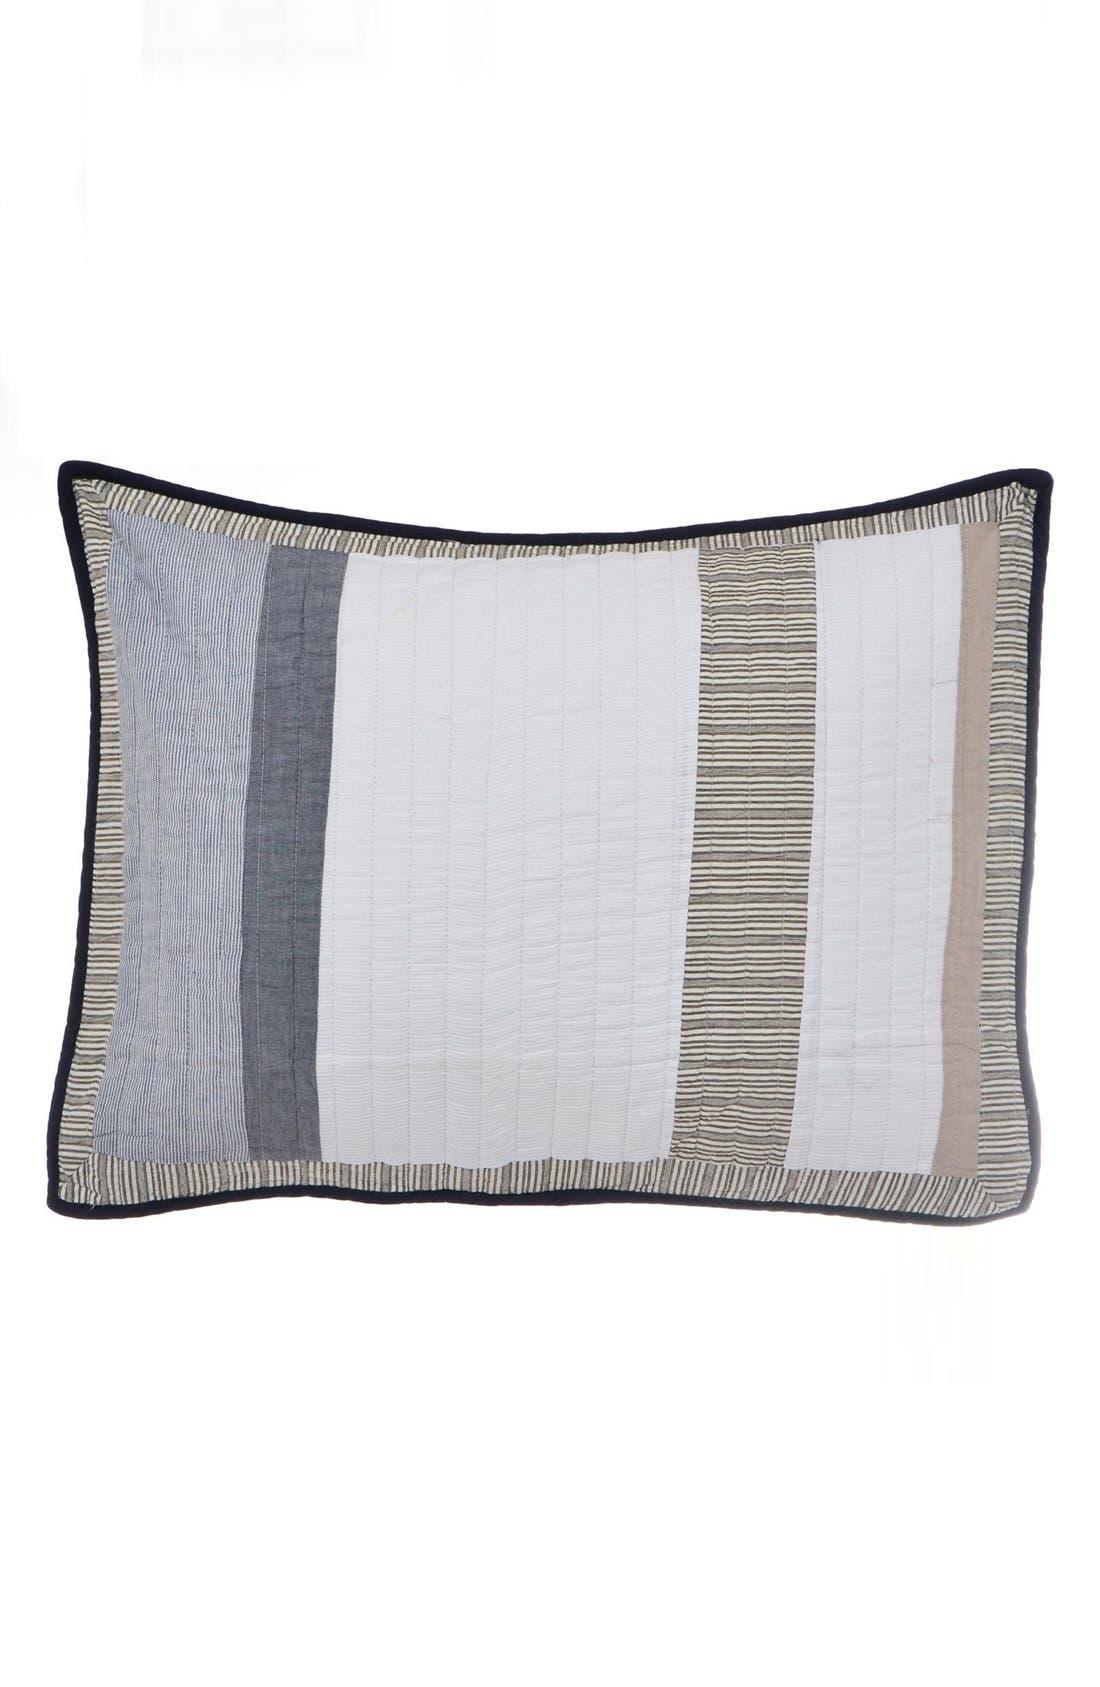 'Tideway' Quilted Standard Sham,                         Main,                         color, Grey/ Khaki